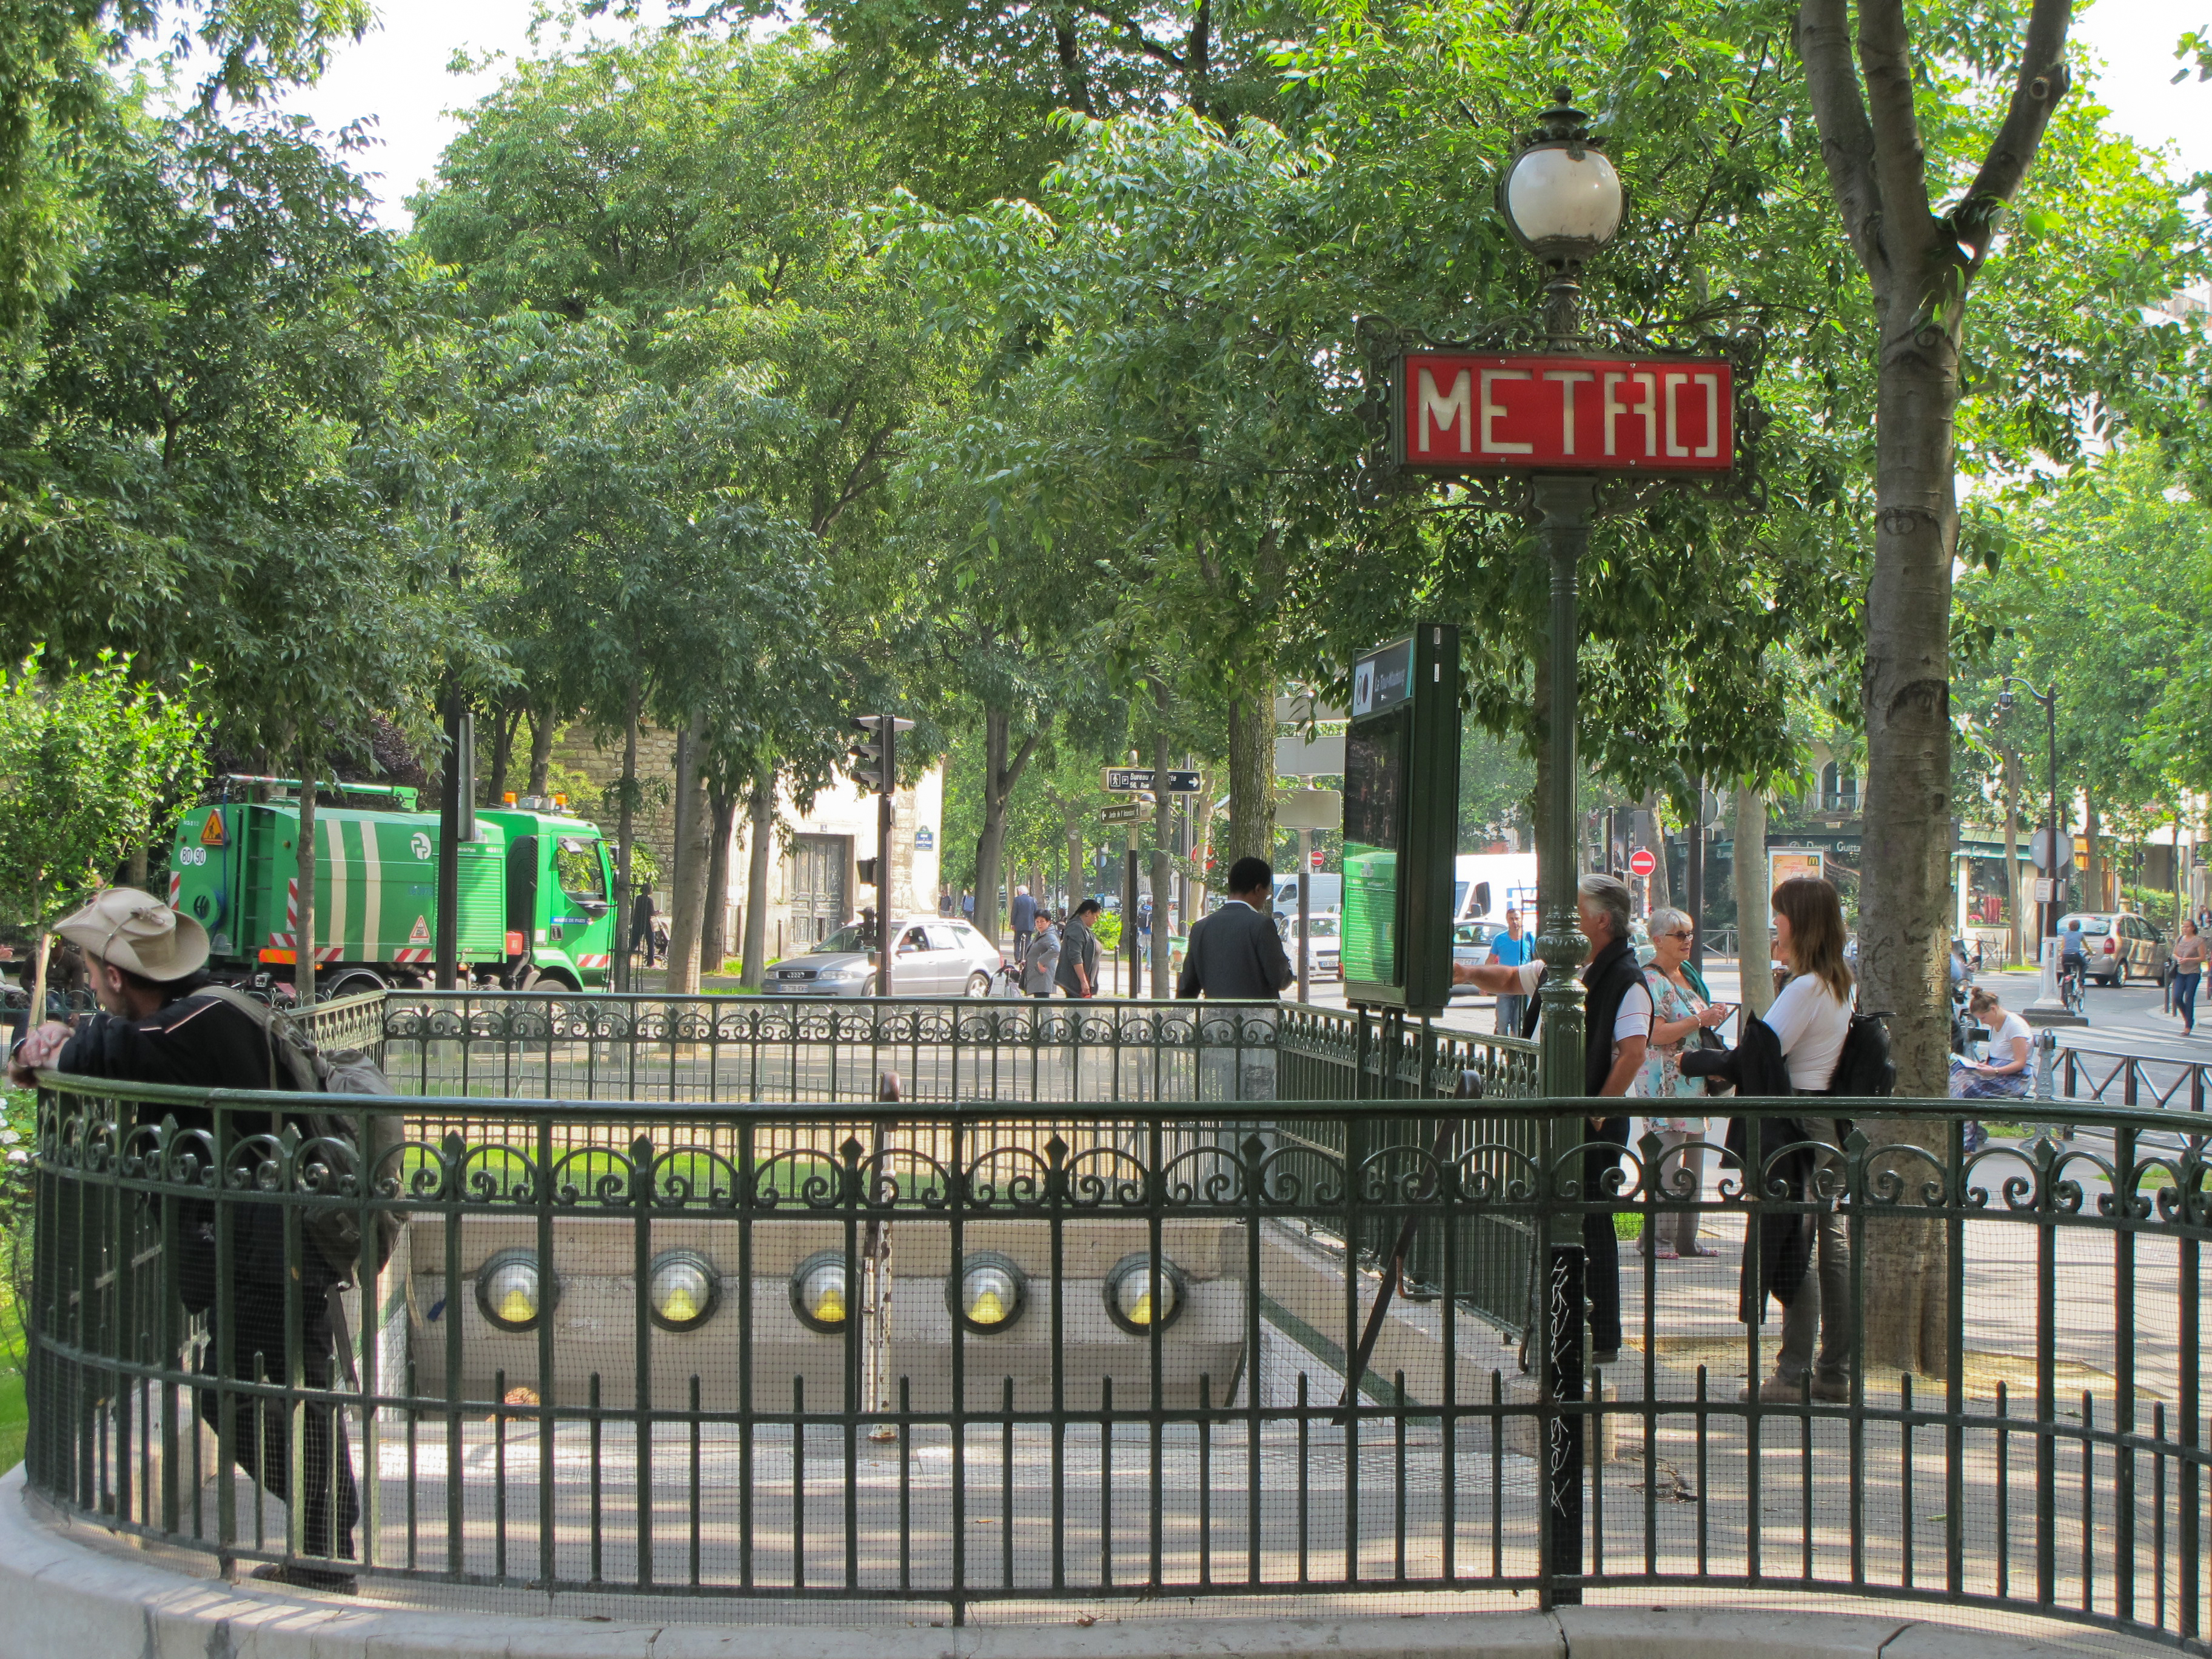 File:Station métro La Tour-Maubourg - IMG 2648.JPG